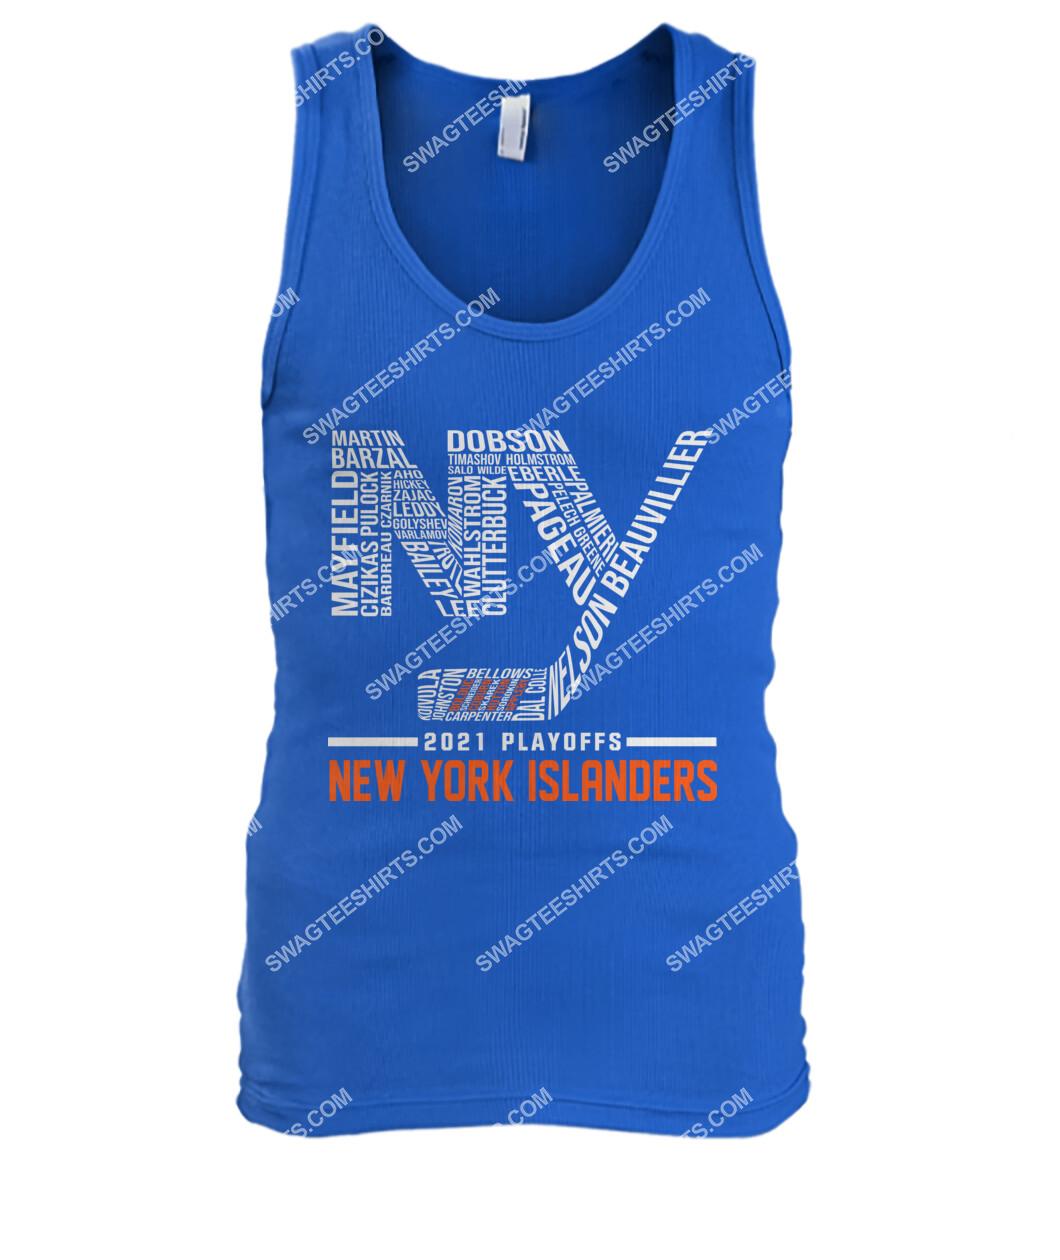 2021 playoffs new york islanders national hockey league tank top 1